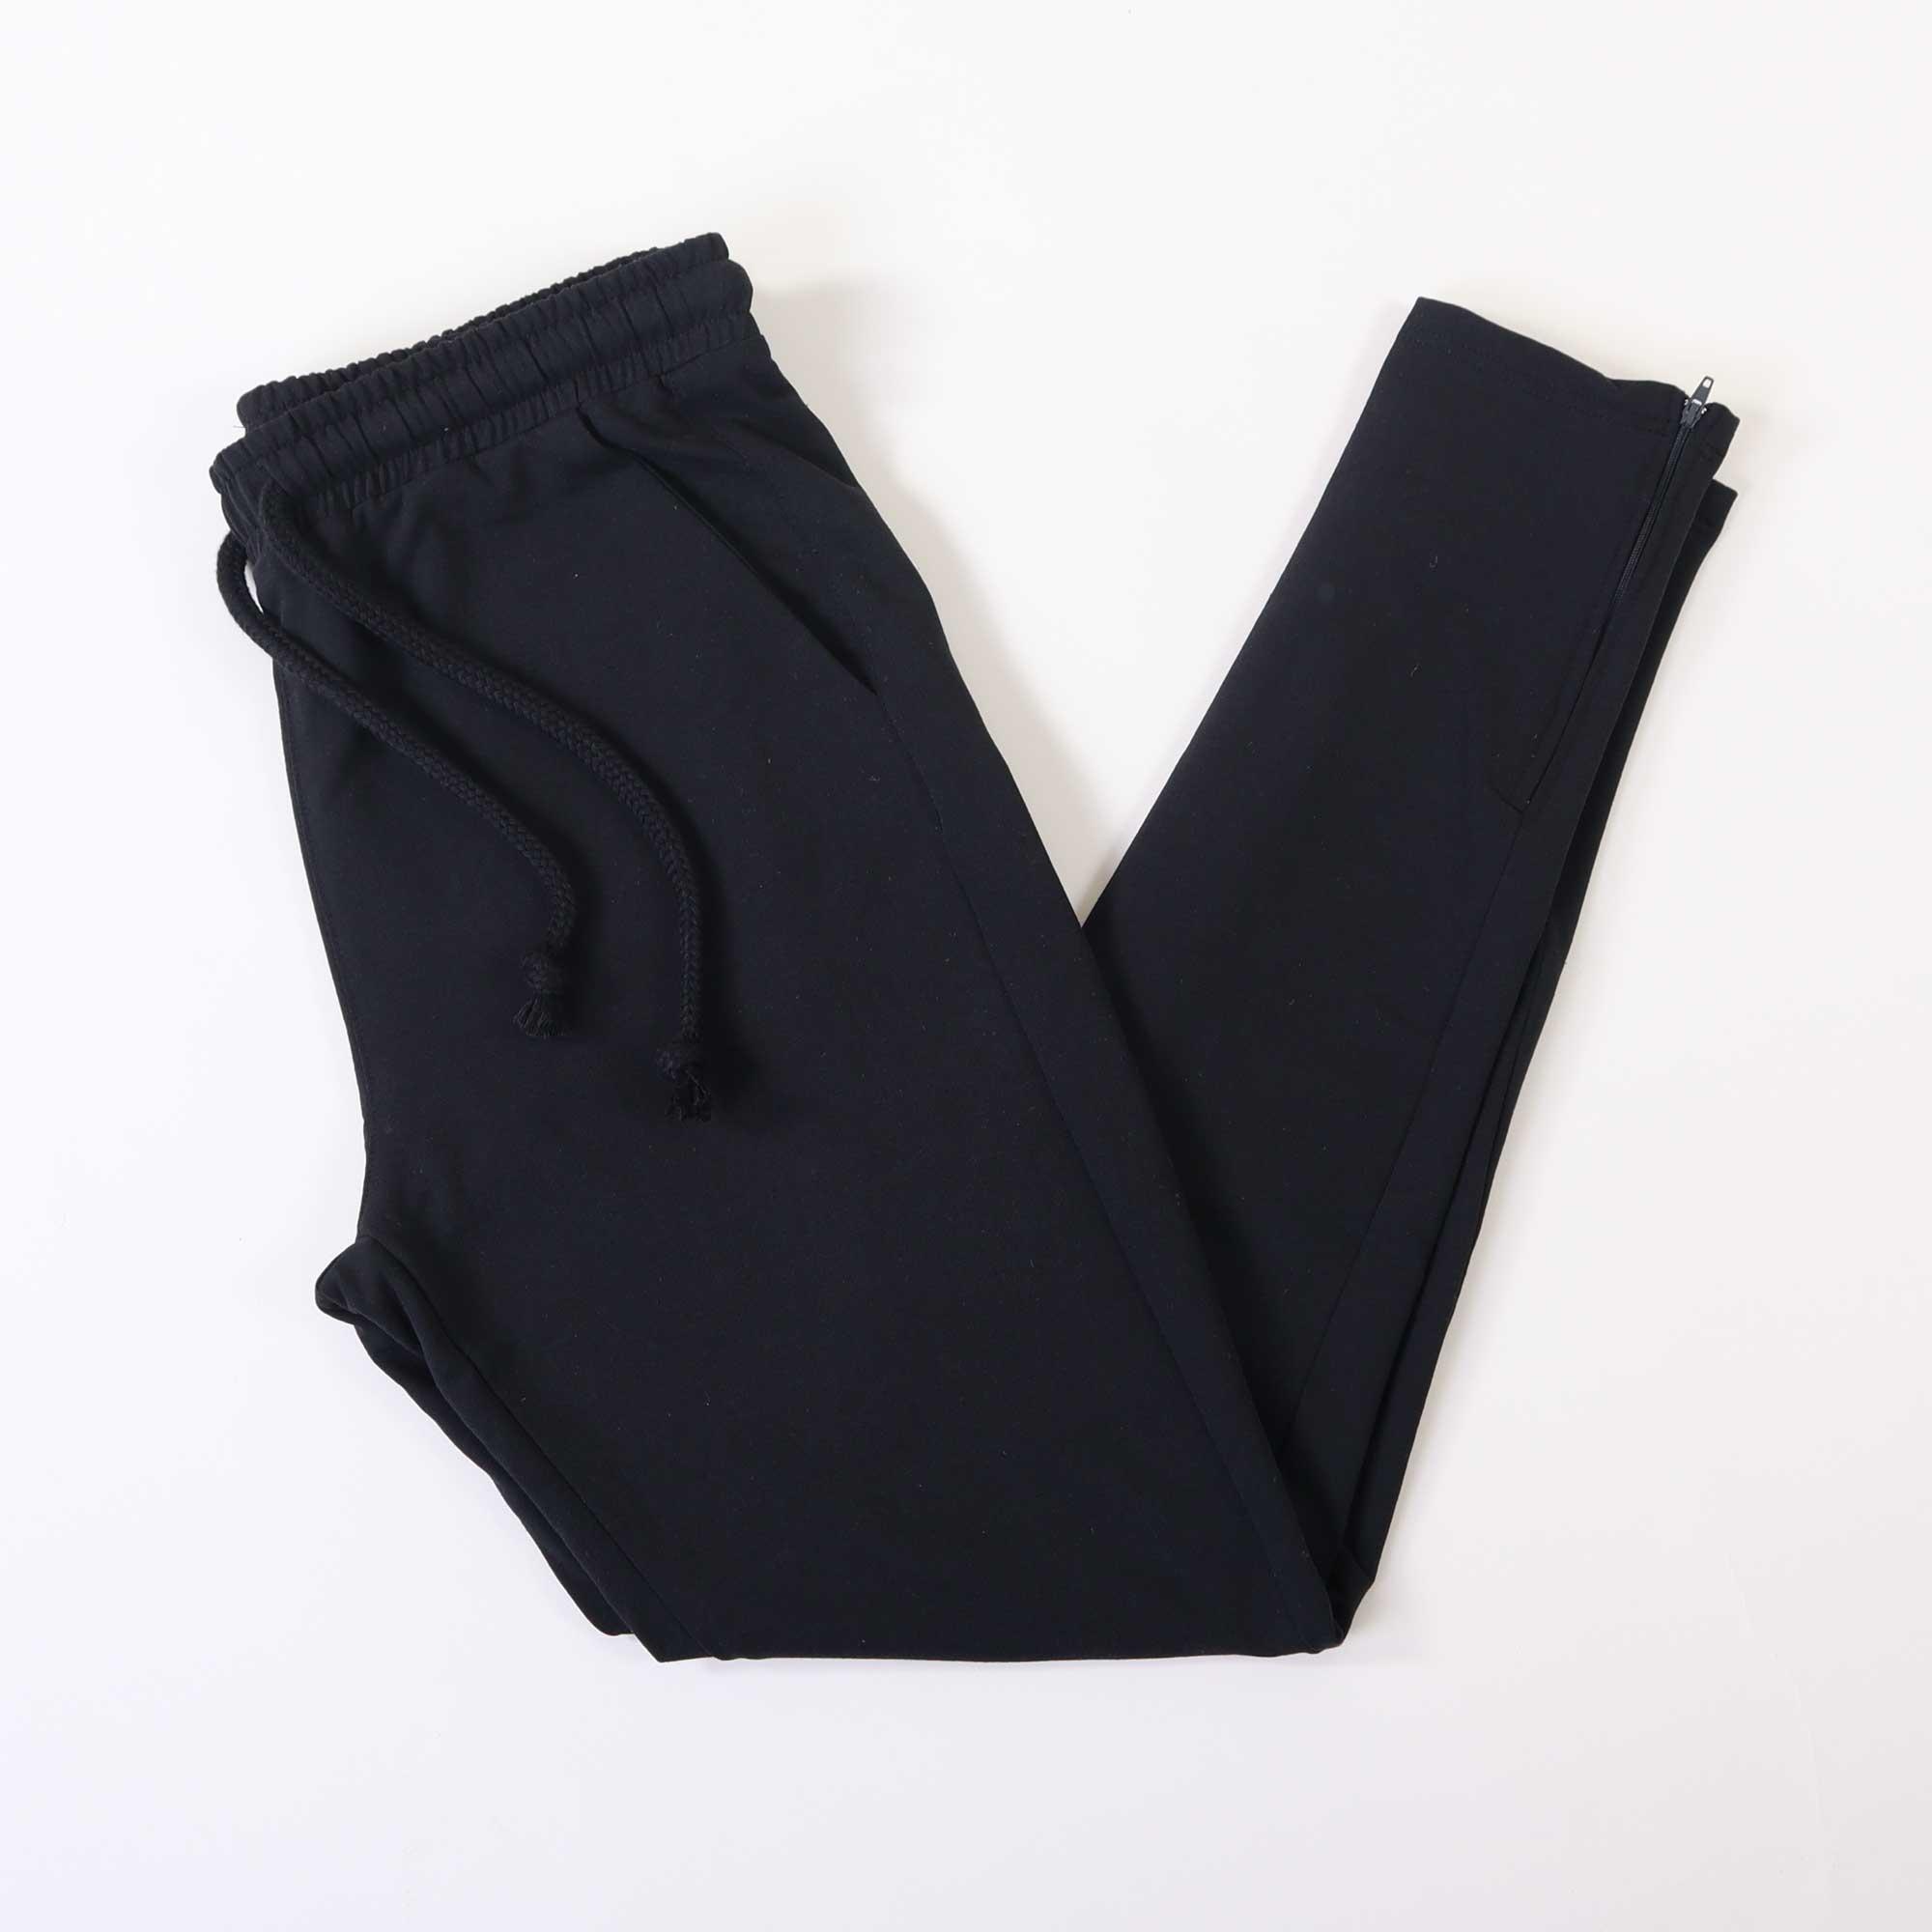 pants-zwart-3